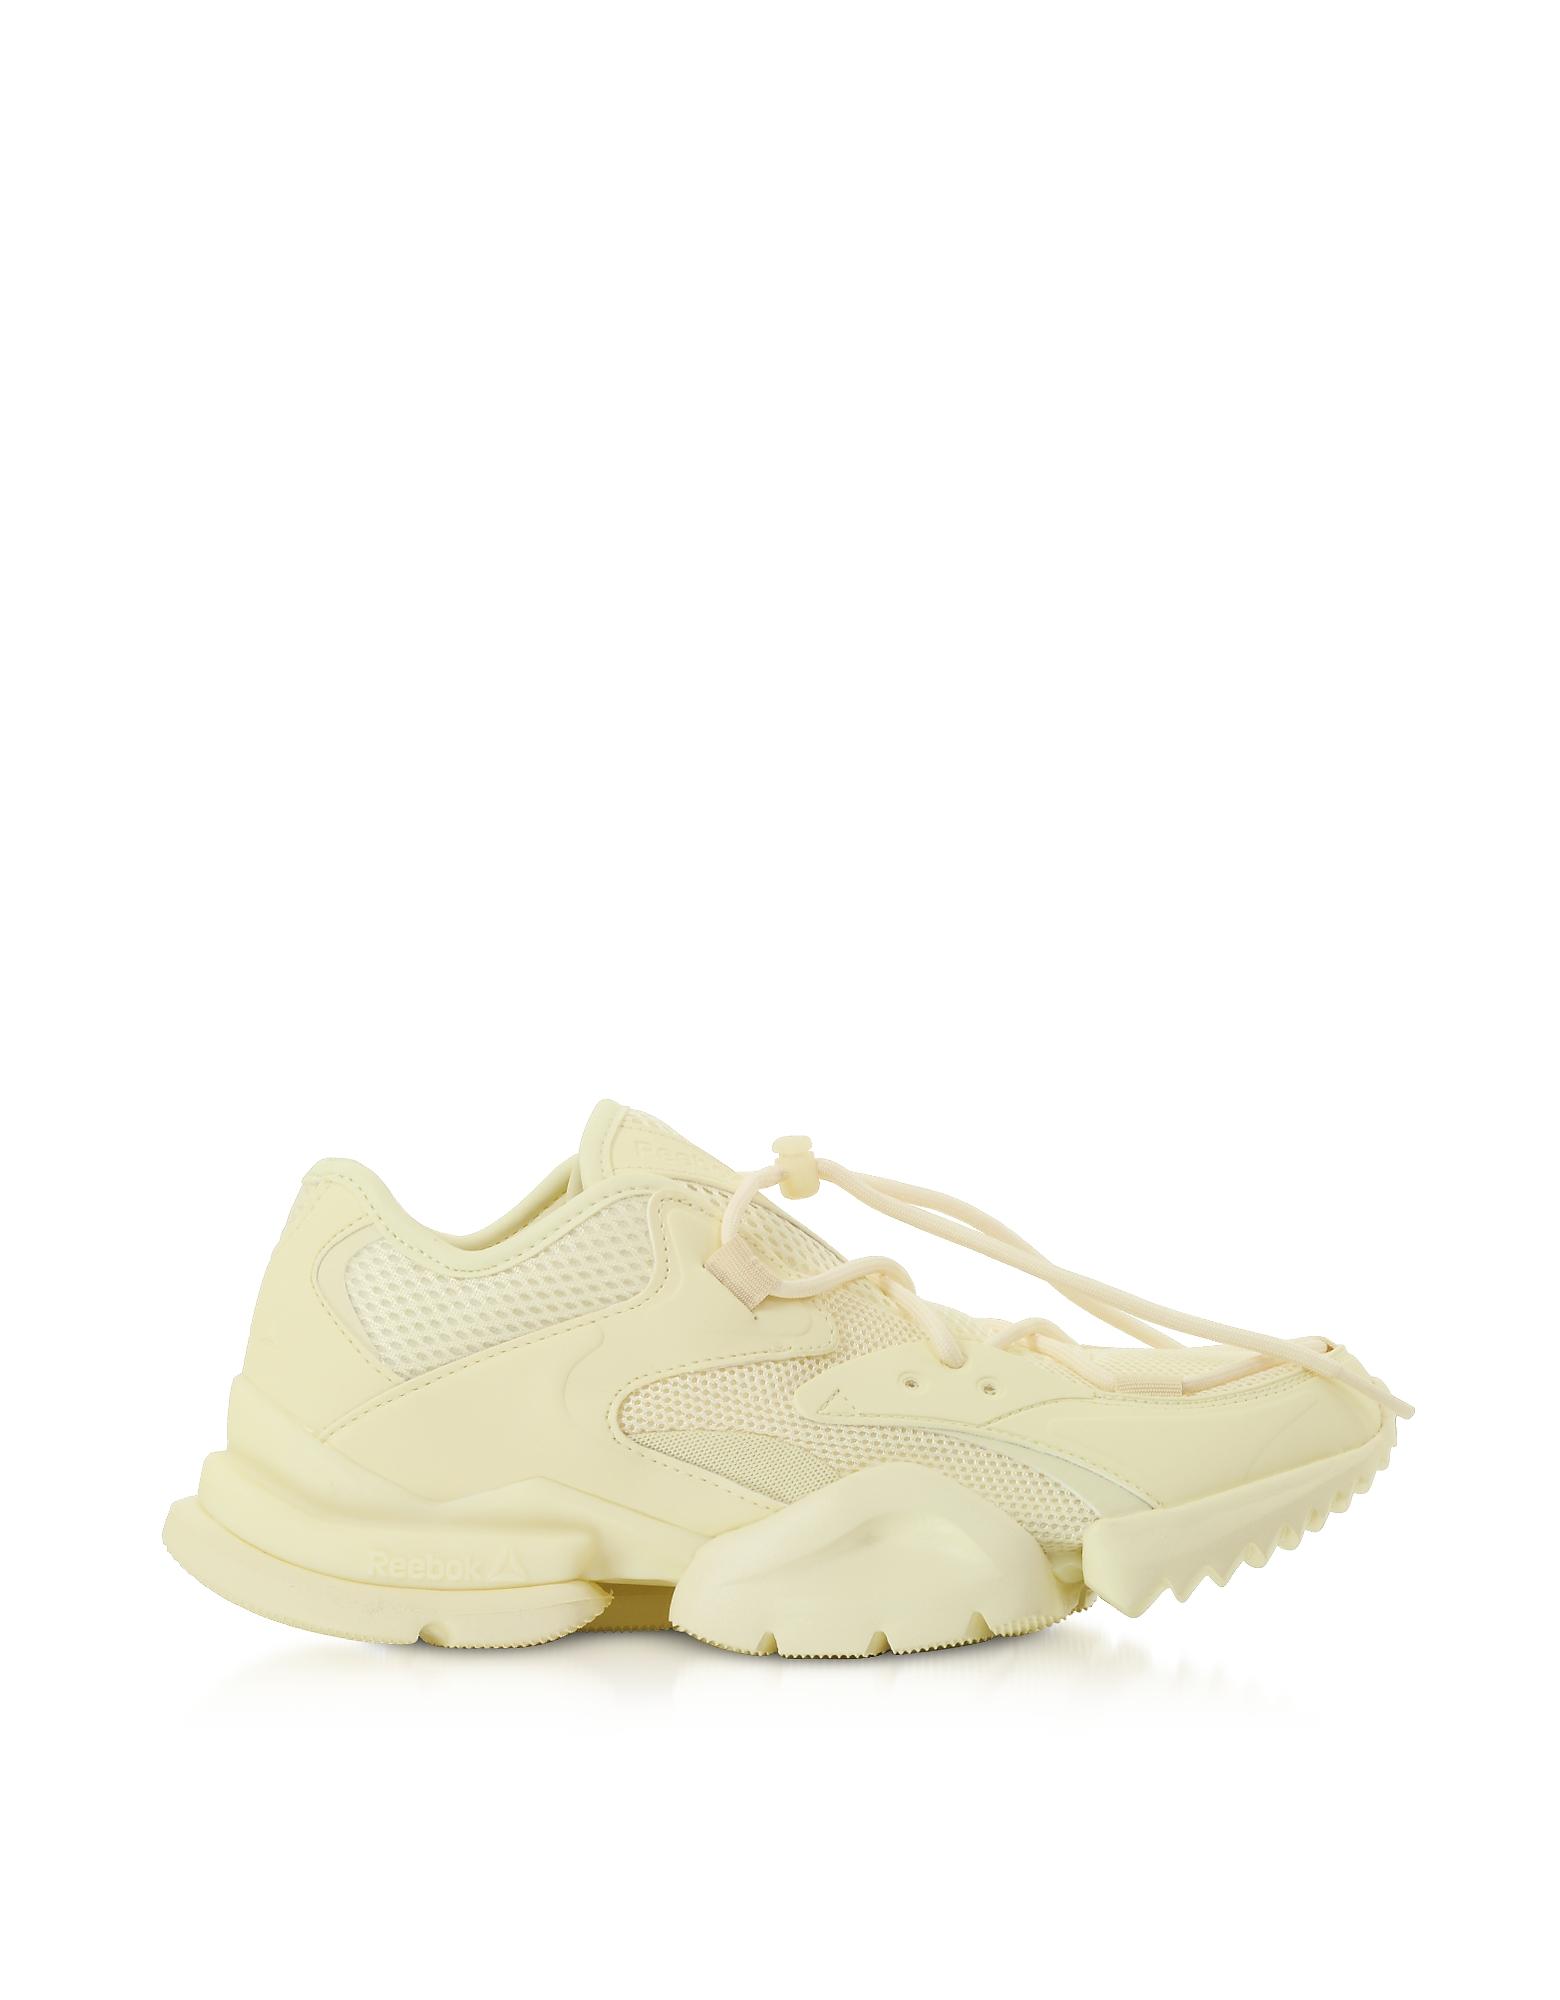 Reebok Classics Designer Shoes, Pale Yellow Run R 96 Sneakers